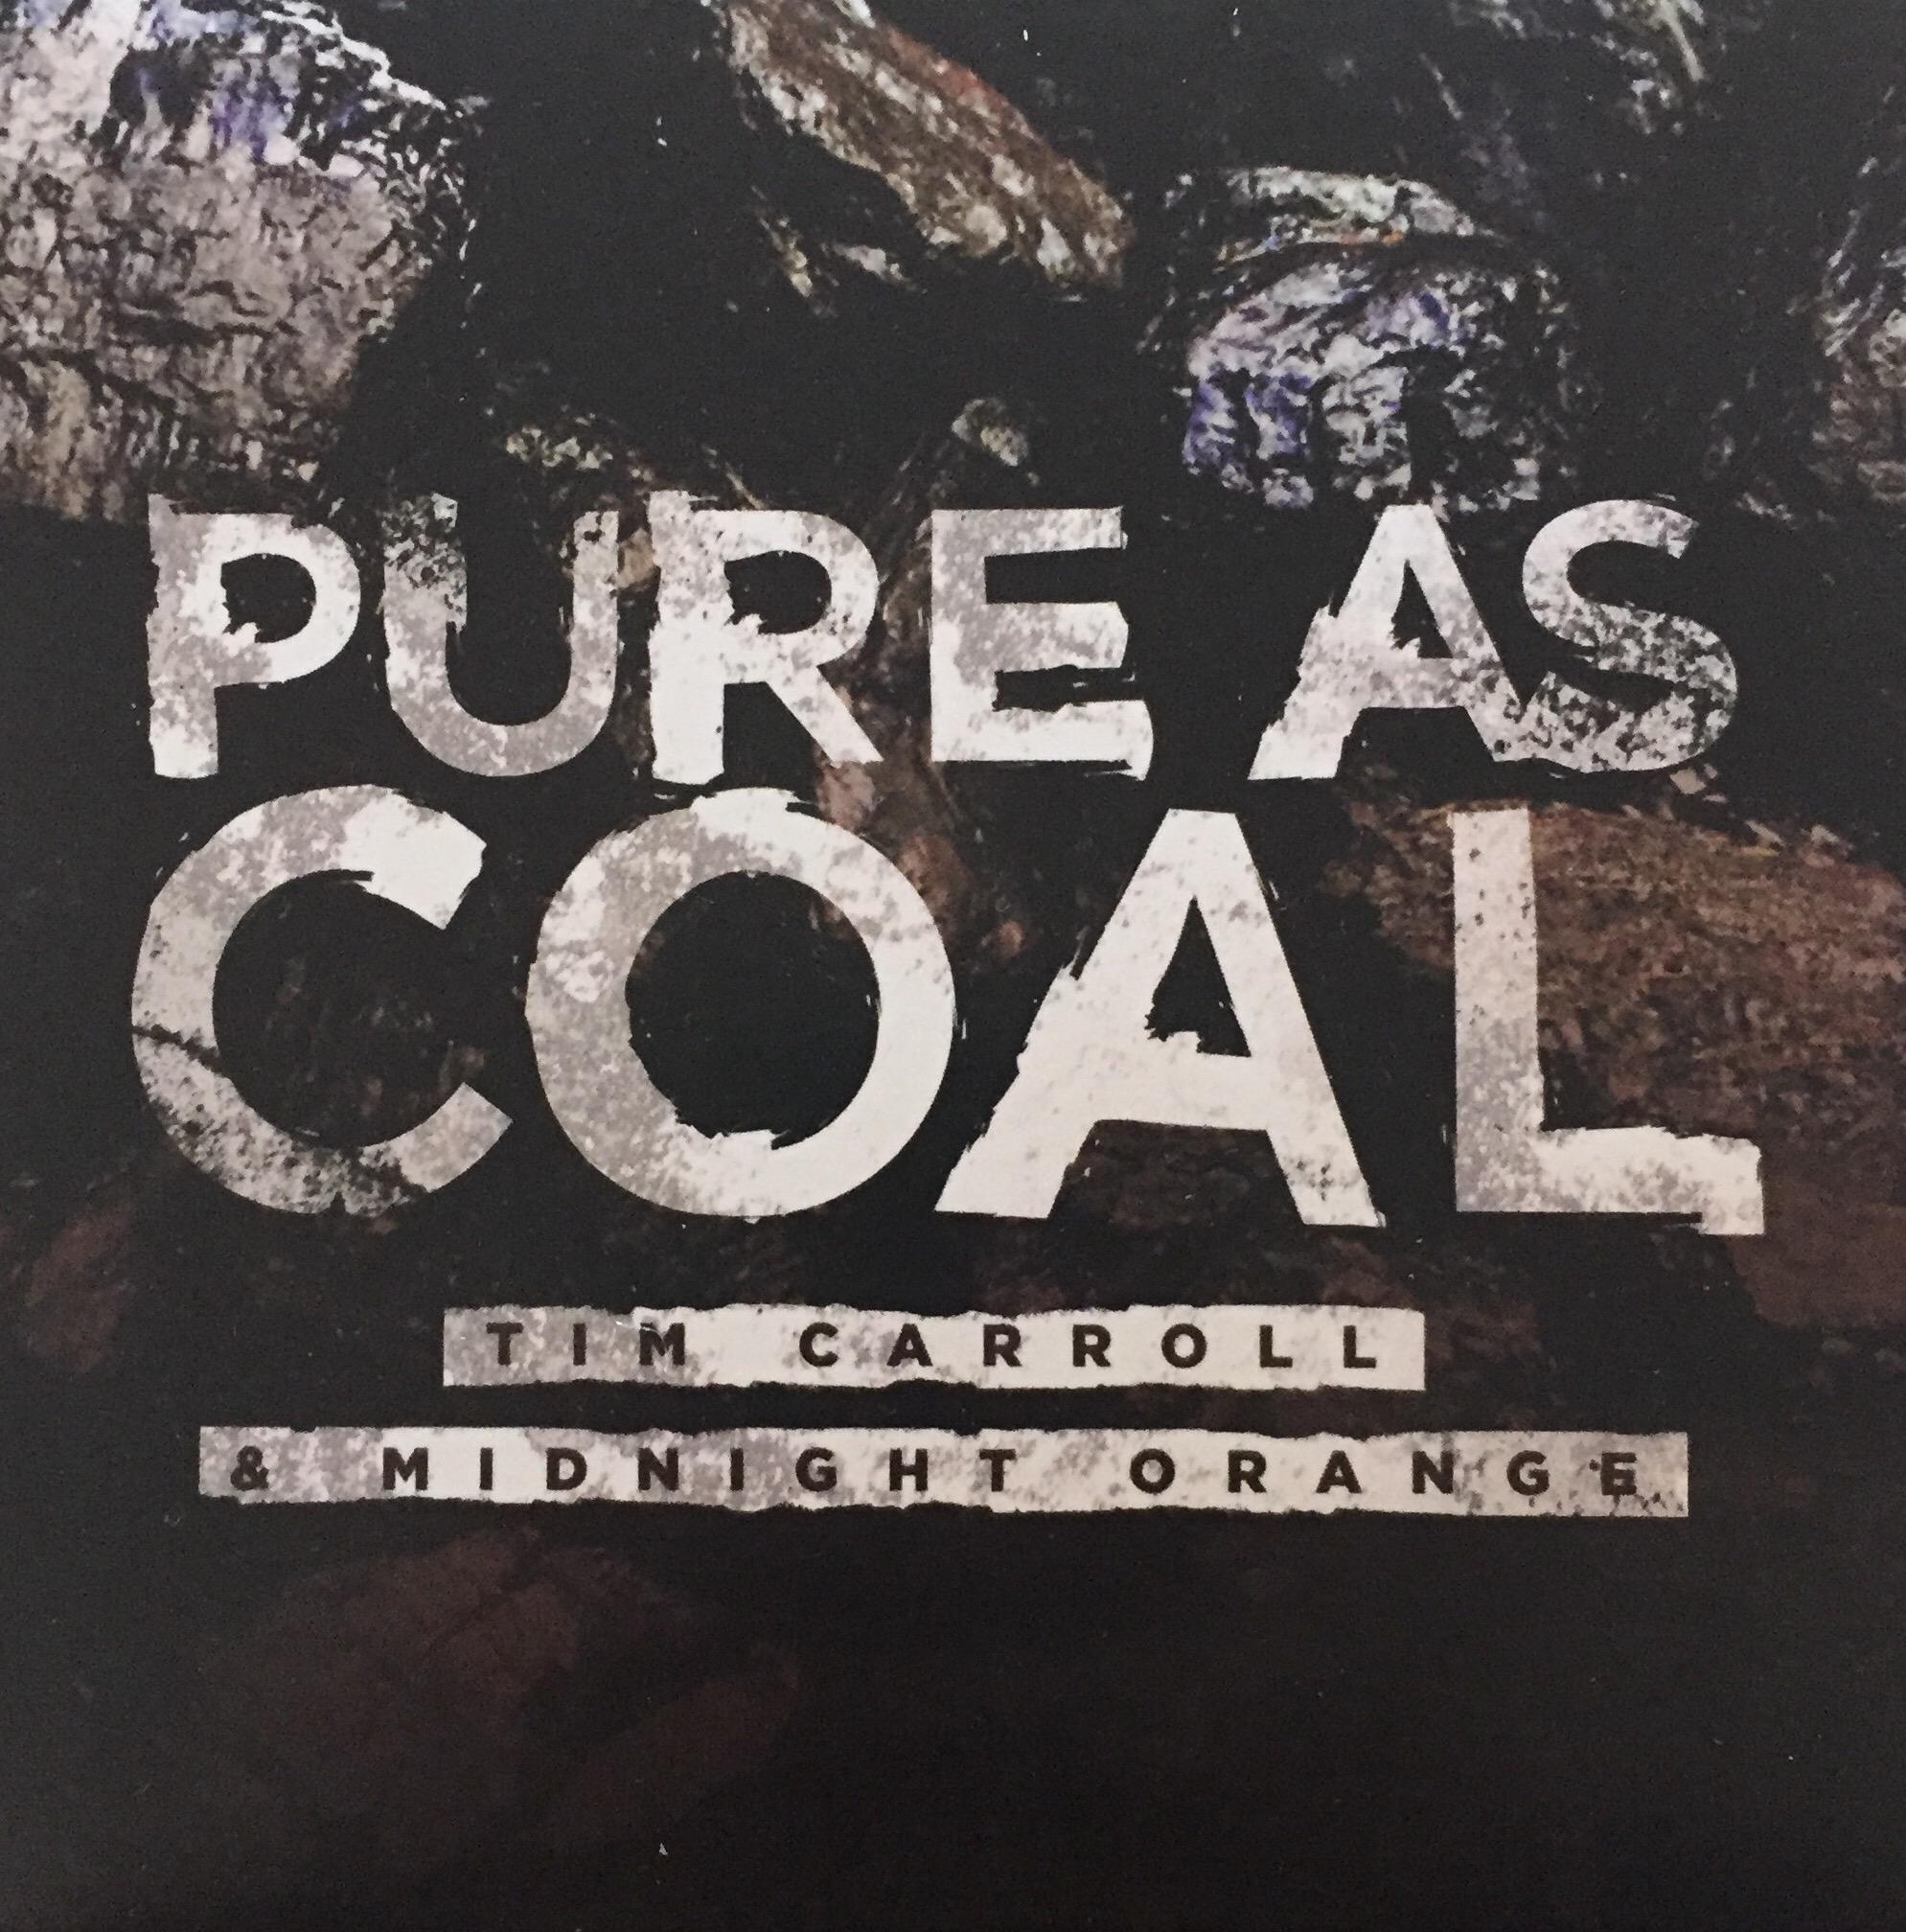 Tim Caroll - Pure As Coal